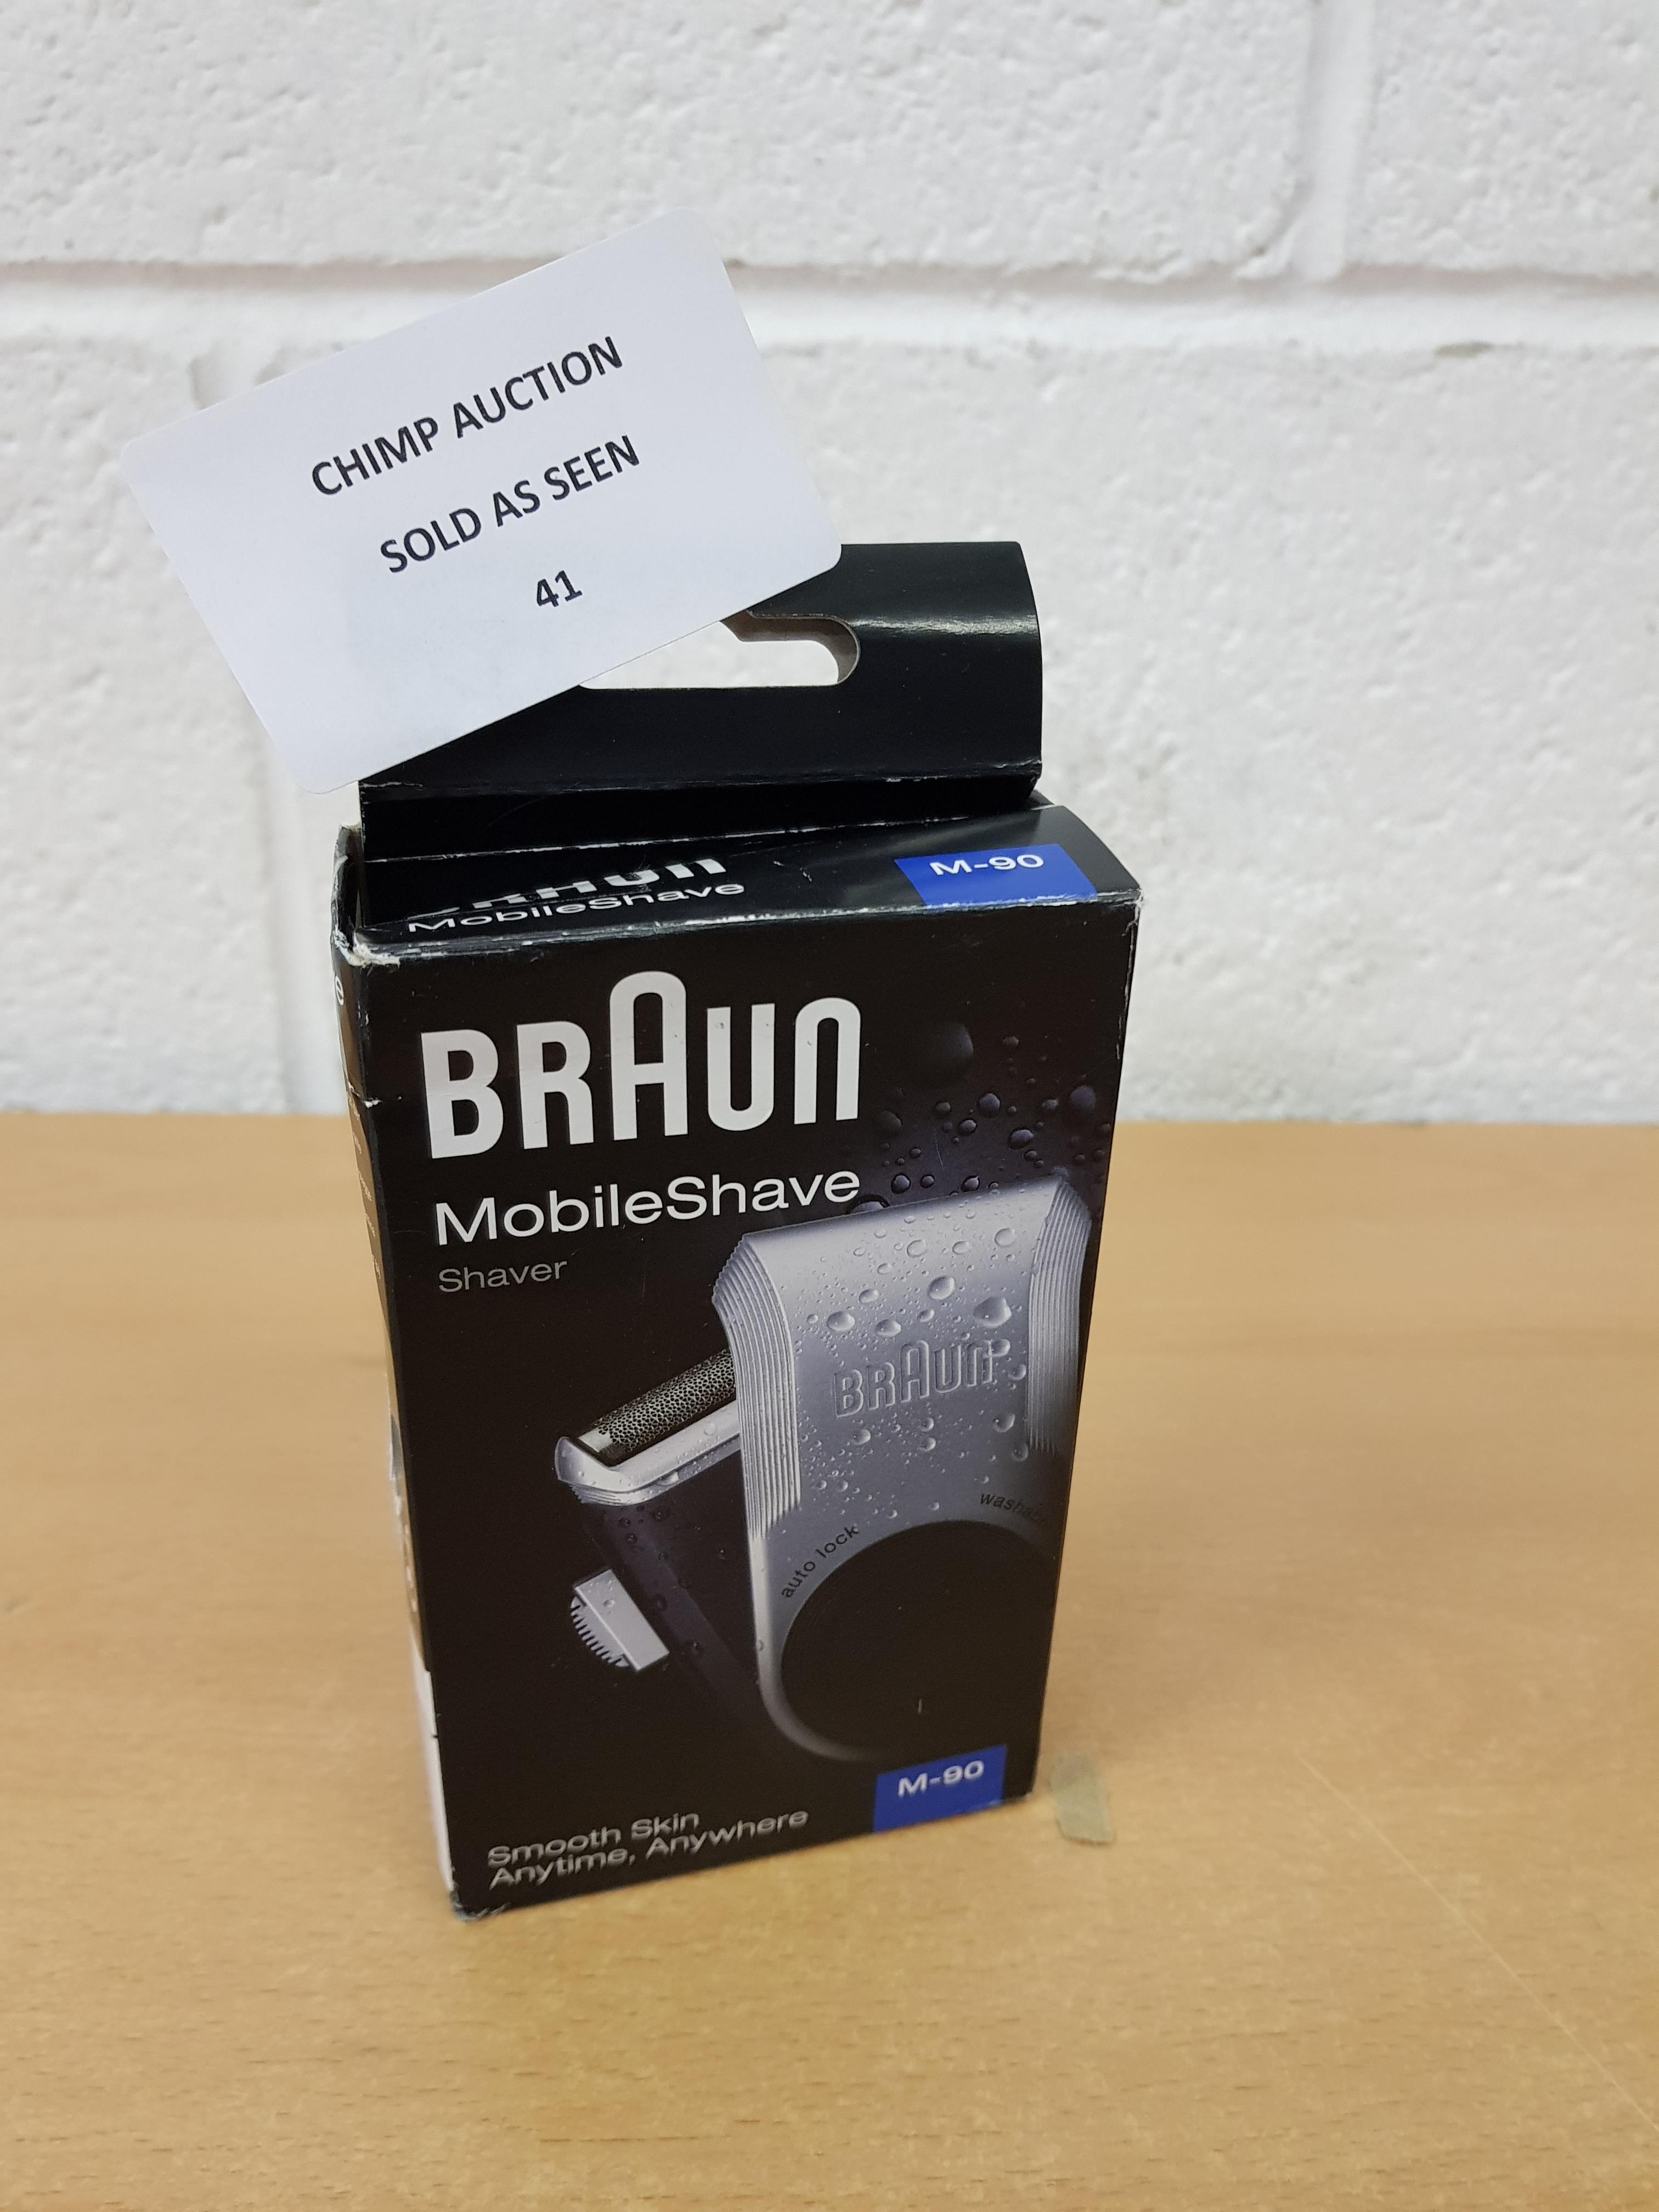 Lot 41 - Braun PocketGo M90 MobileShave Portable Shaver